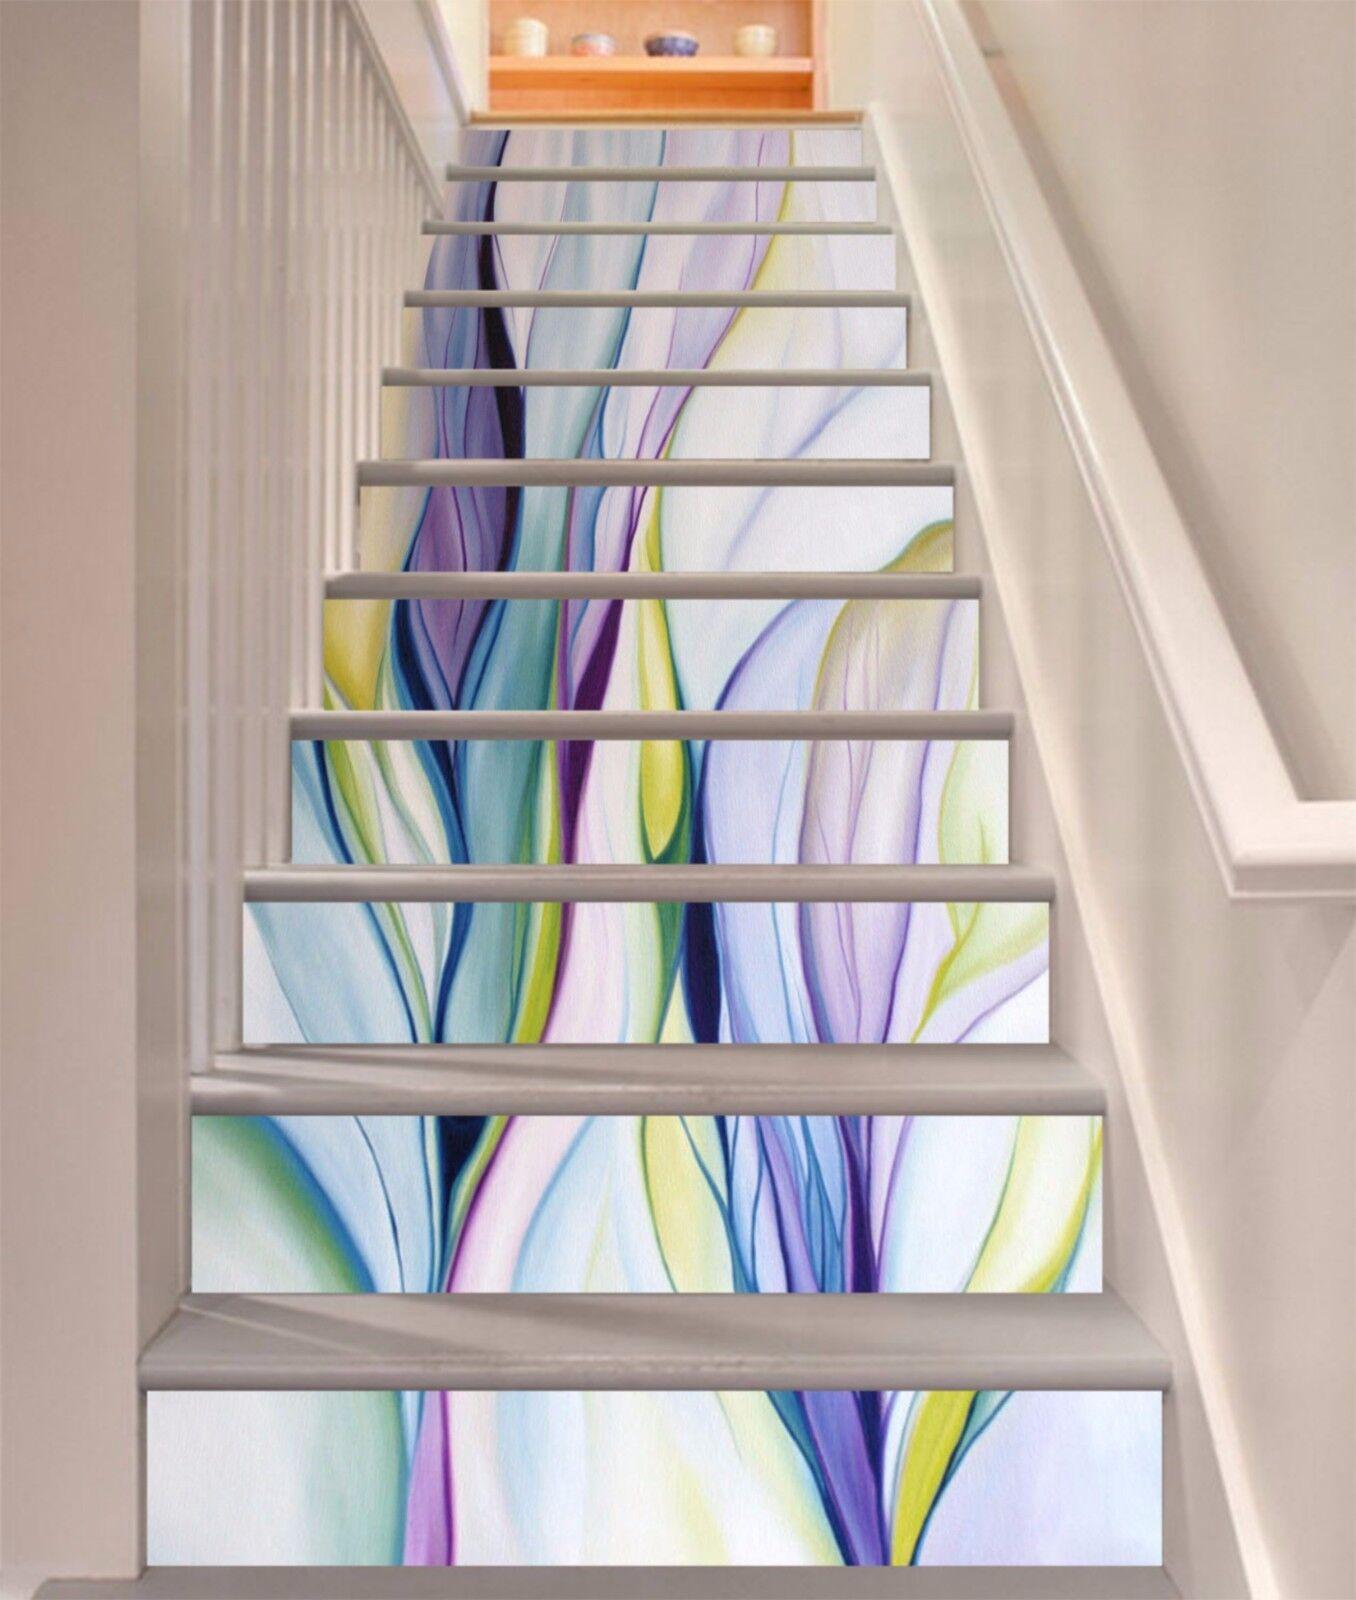 3D Bunte Gemälde 87 Stair Risers Dekoration Fototapete Vinyl Aufkleber Tapete DE